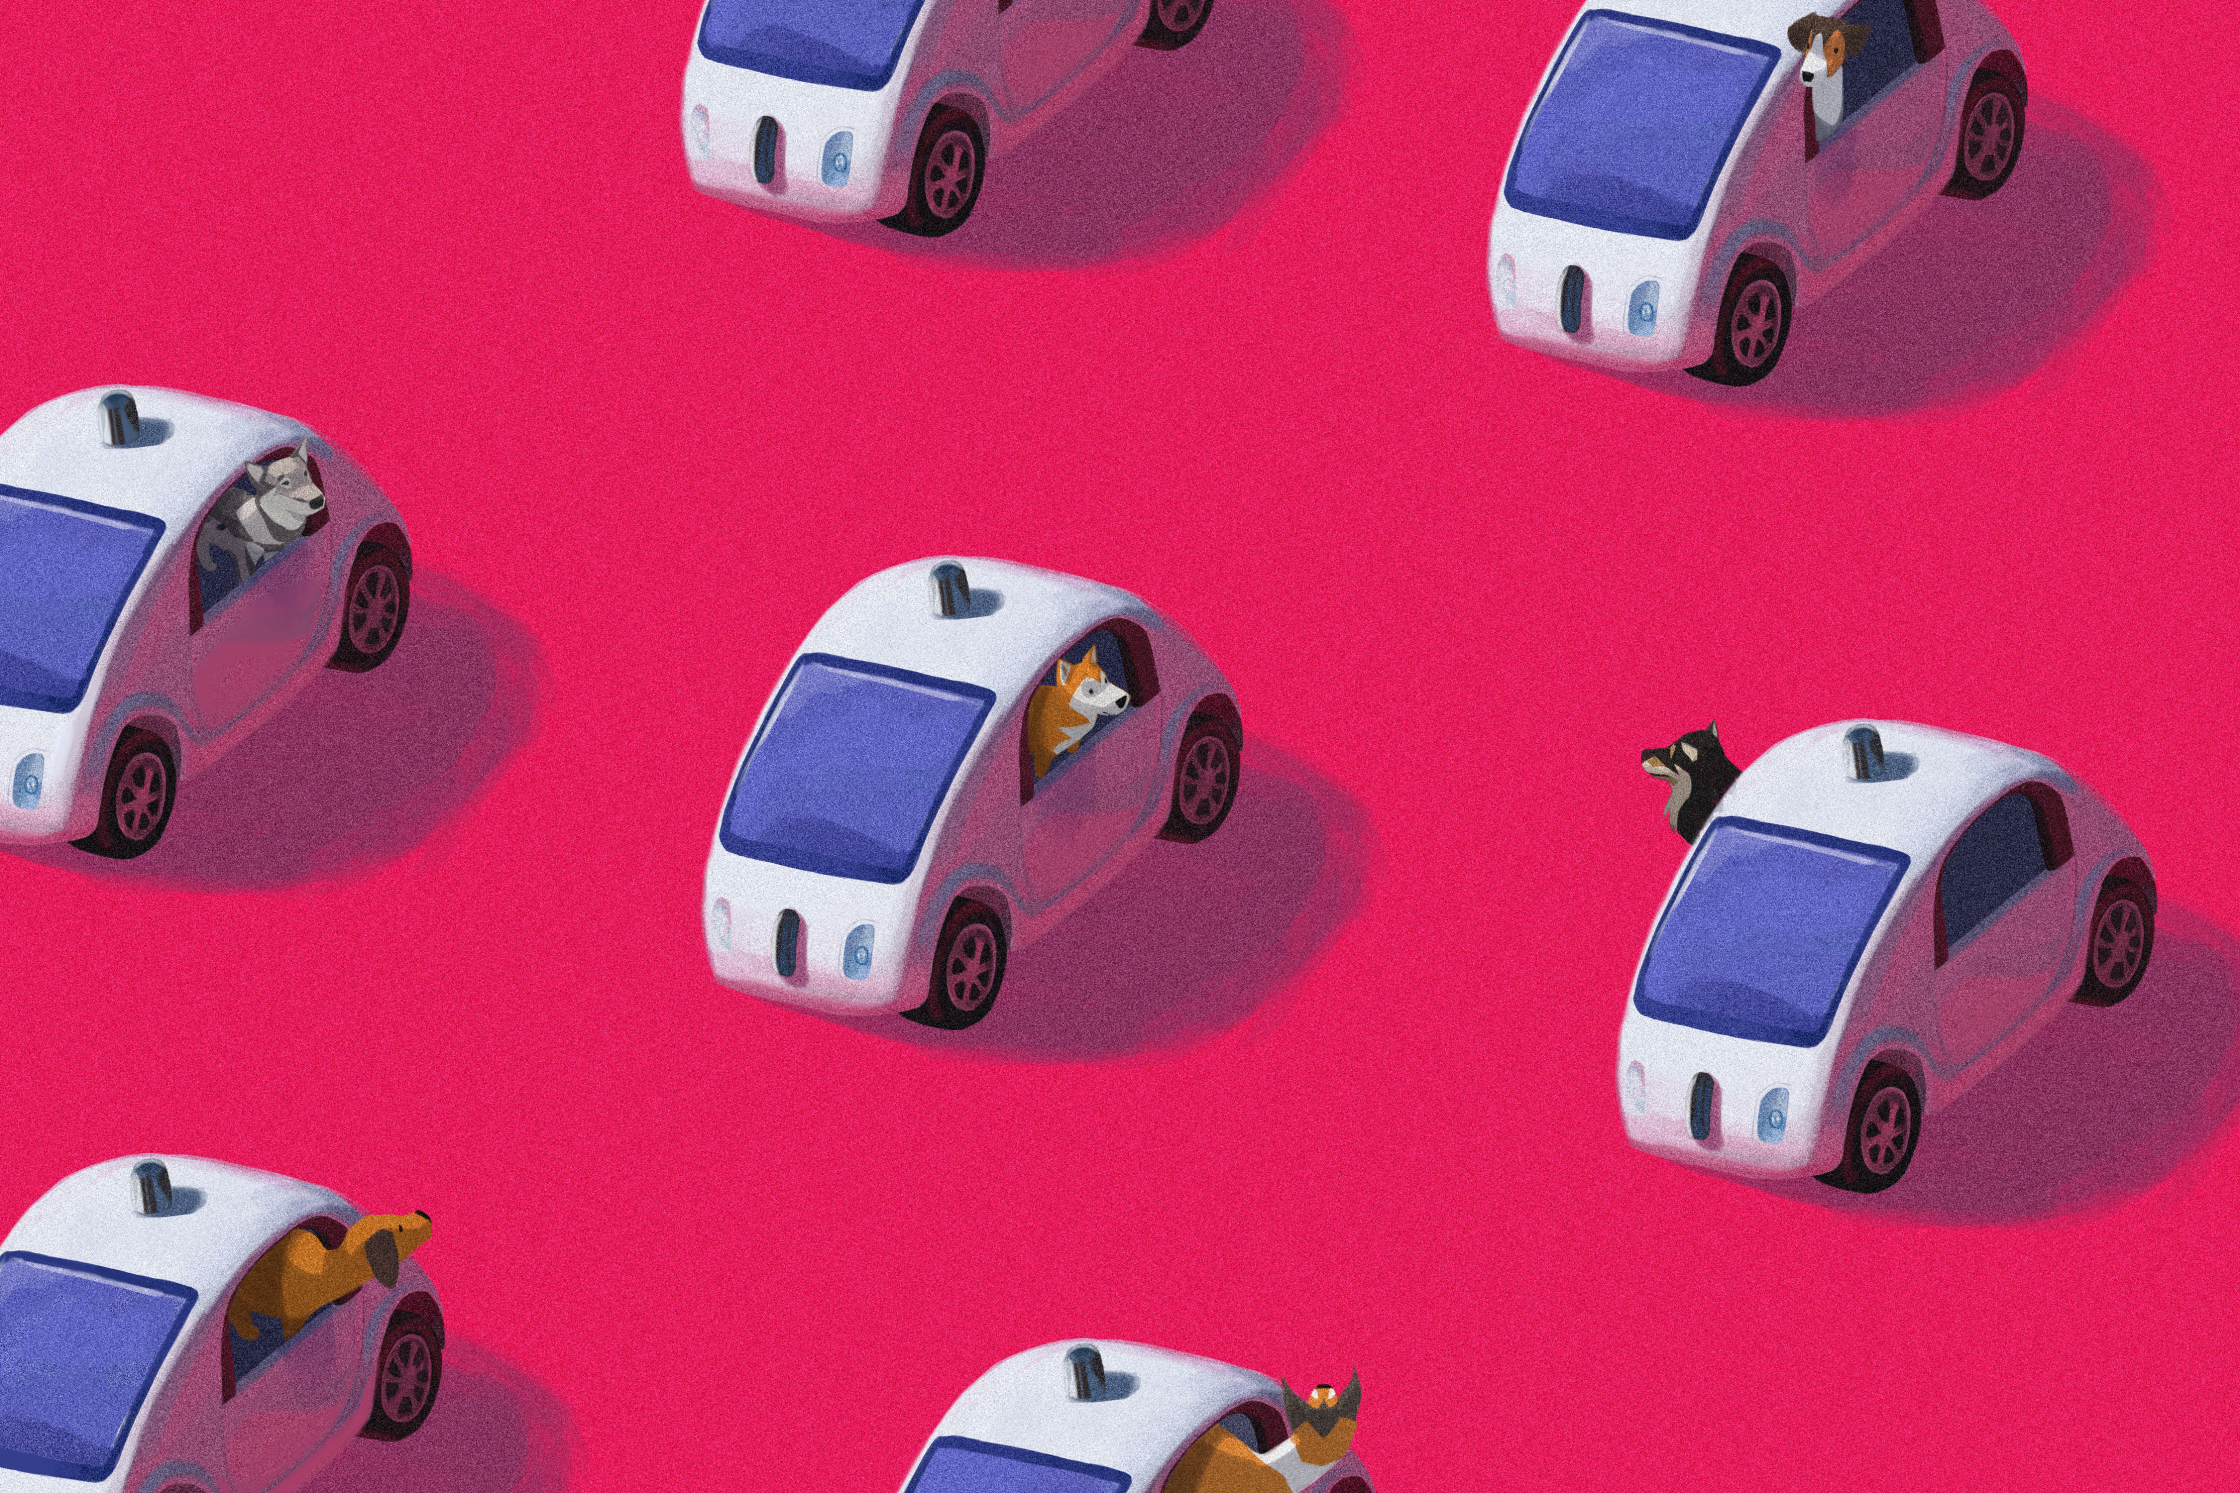 09_selfdrivingcars.jpg